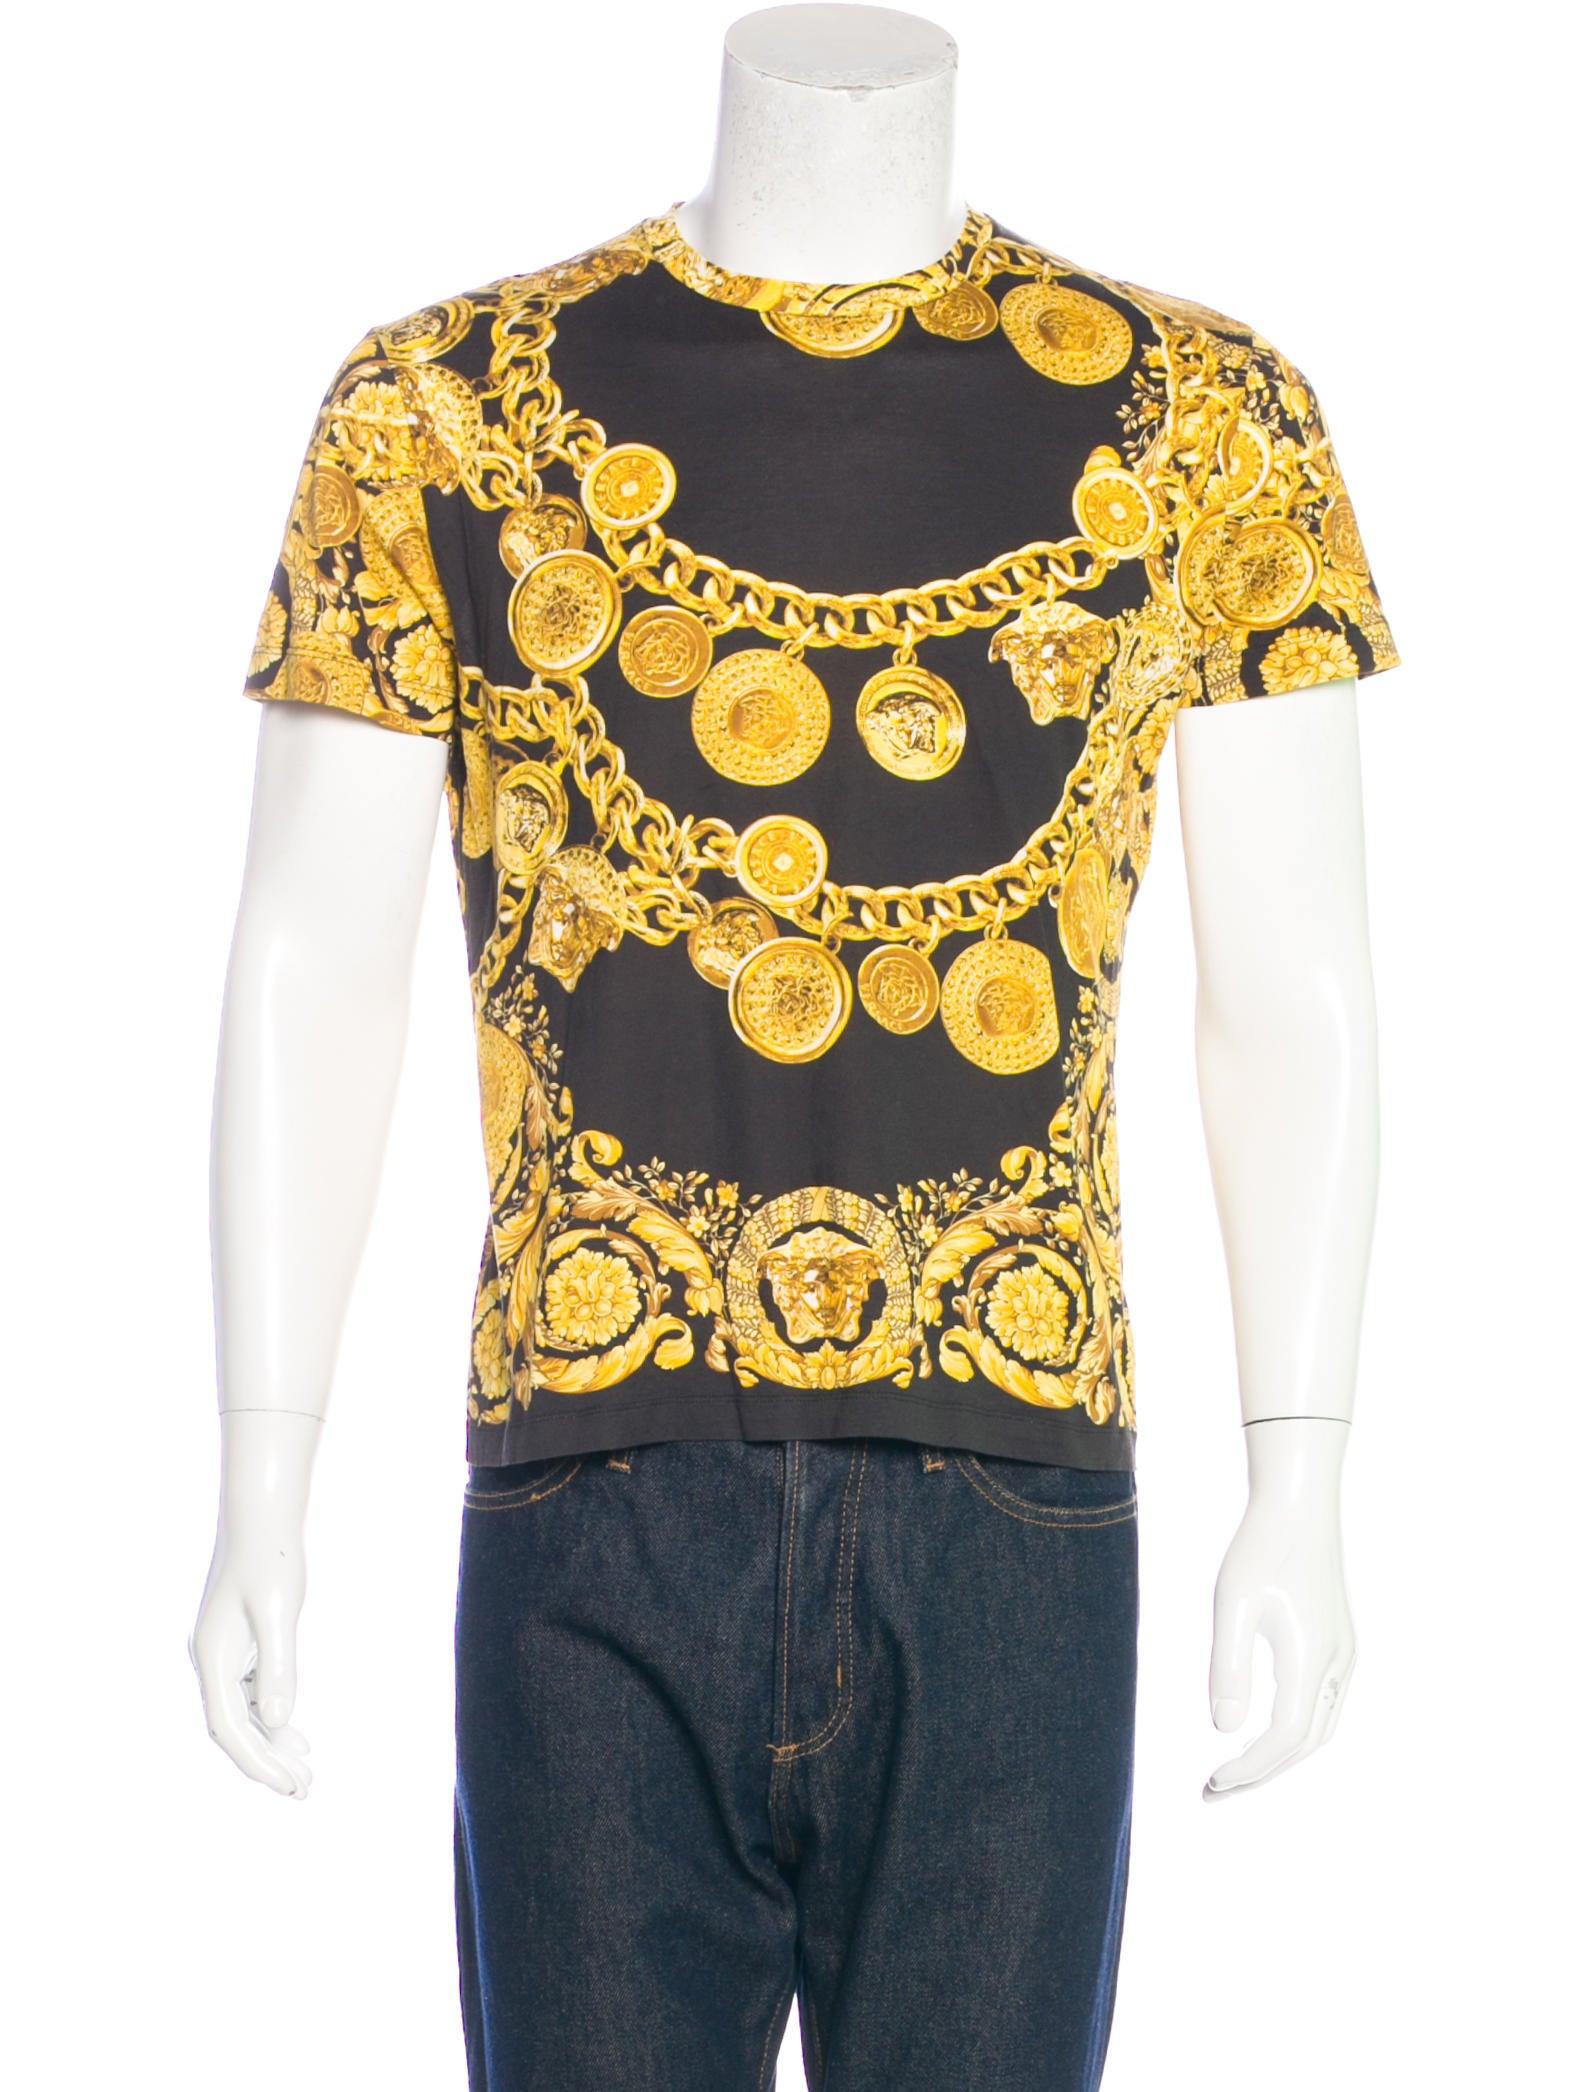 0a0b119c Versace Palazzo Chain Print T-Shirt - Clothing - VES31383 | The RealReal